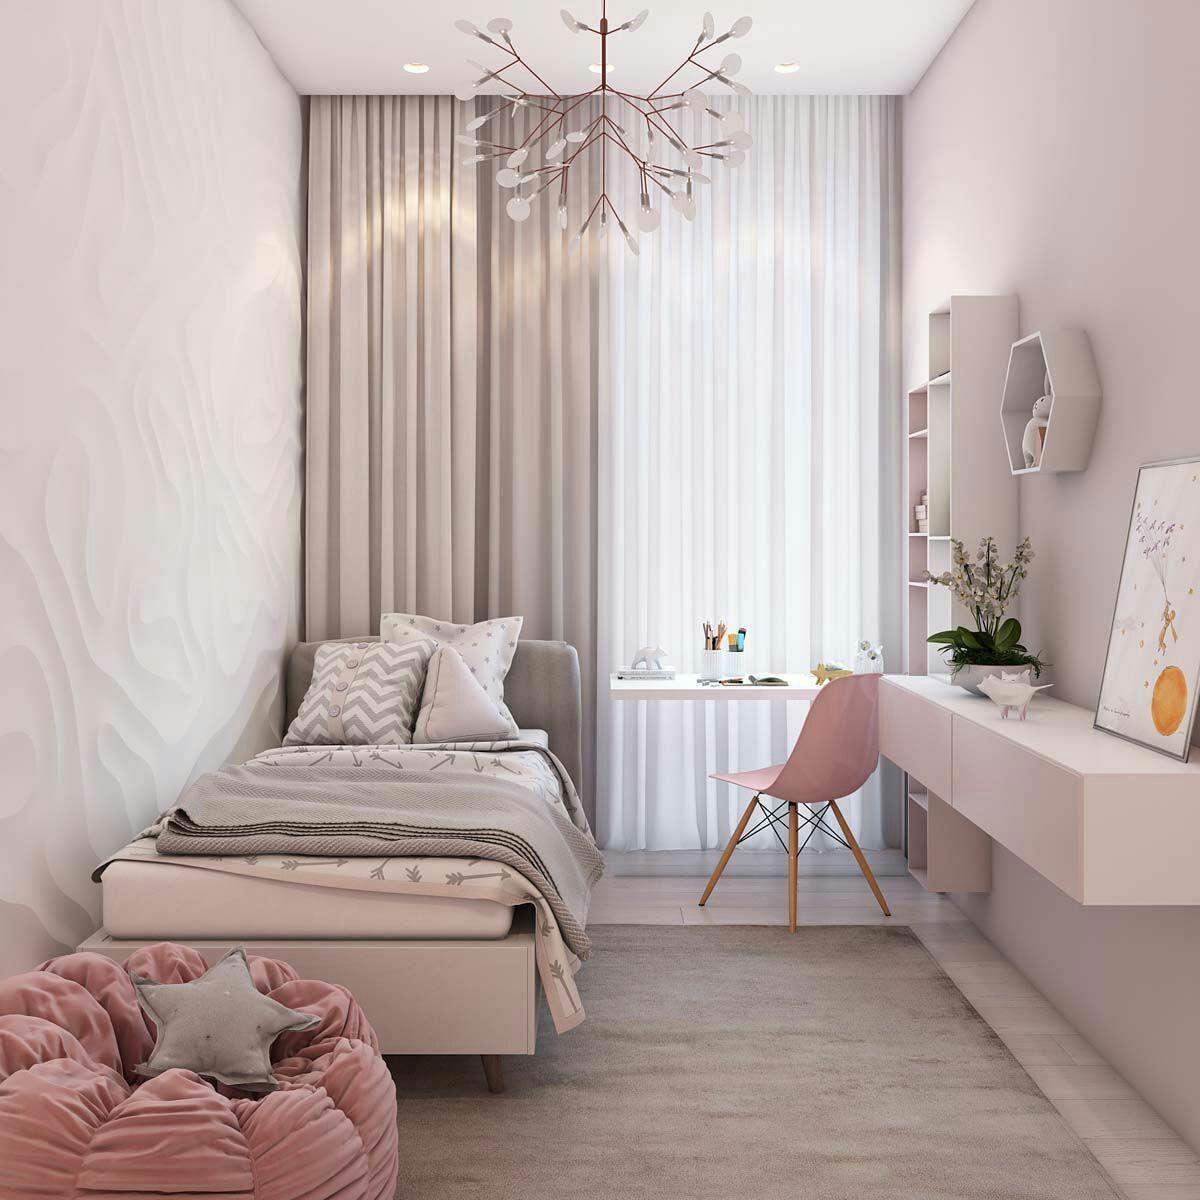 Sassy Boy In 2021 Minimalist Bedroom Design Room Decor Bedroom Bedroom Decor Pink minimalist room decoration